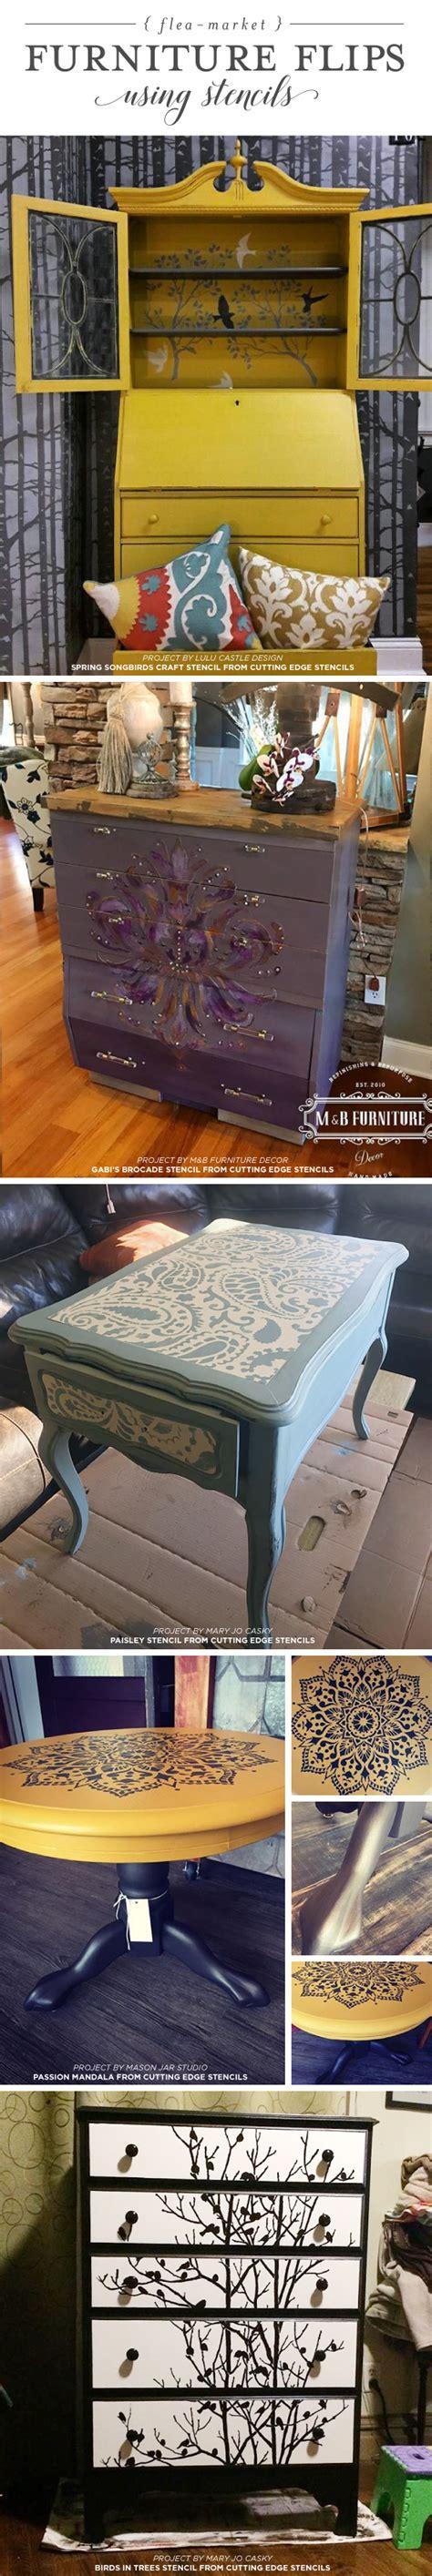 flea market furniture flips using stencils stencil